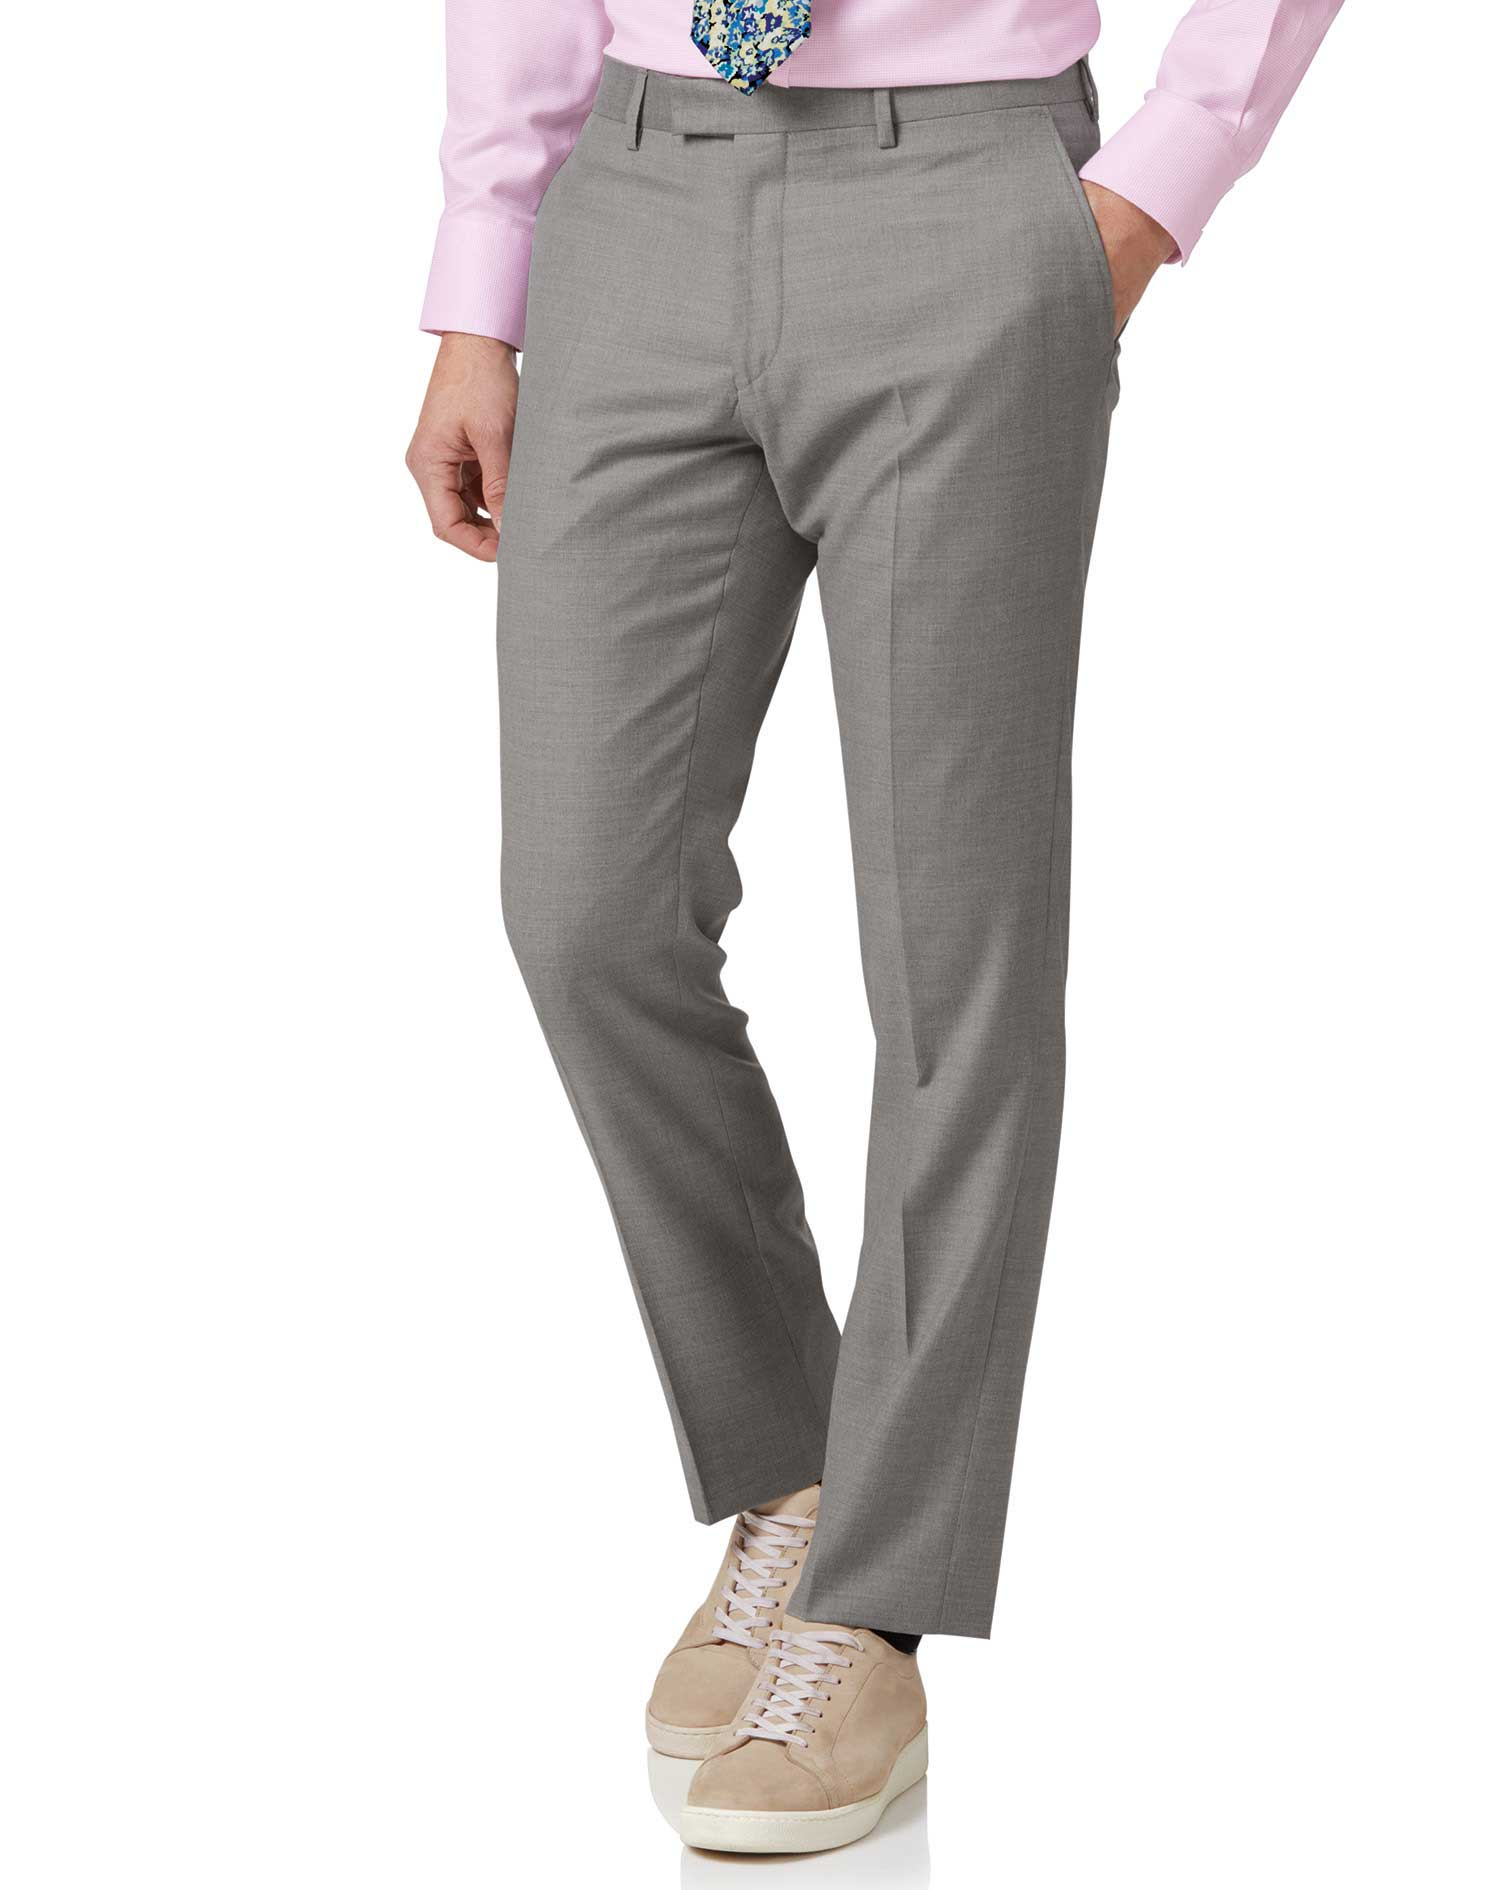 Silver Slim Fit Italian Suit Trouser Size W32 L34 by Charles Tyrwhitt